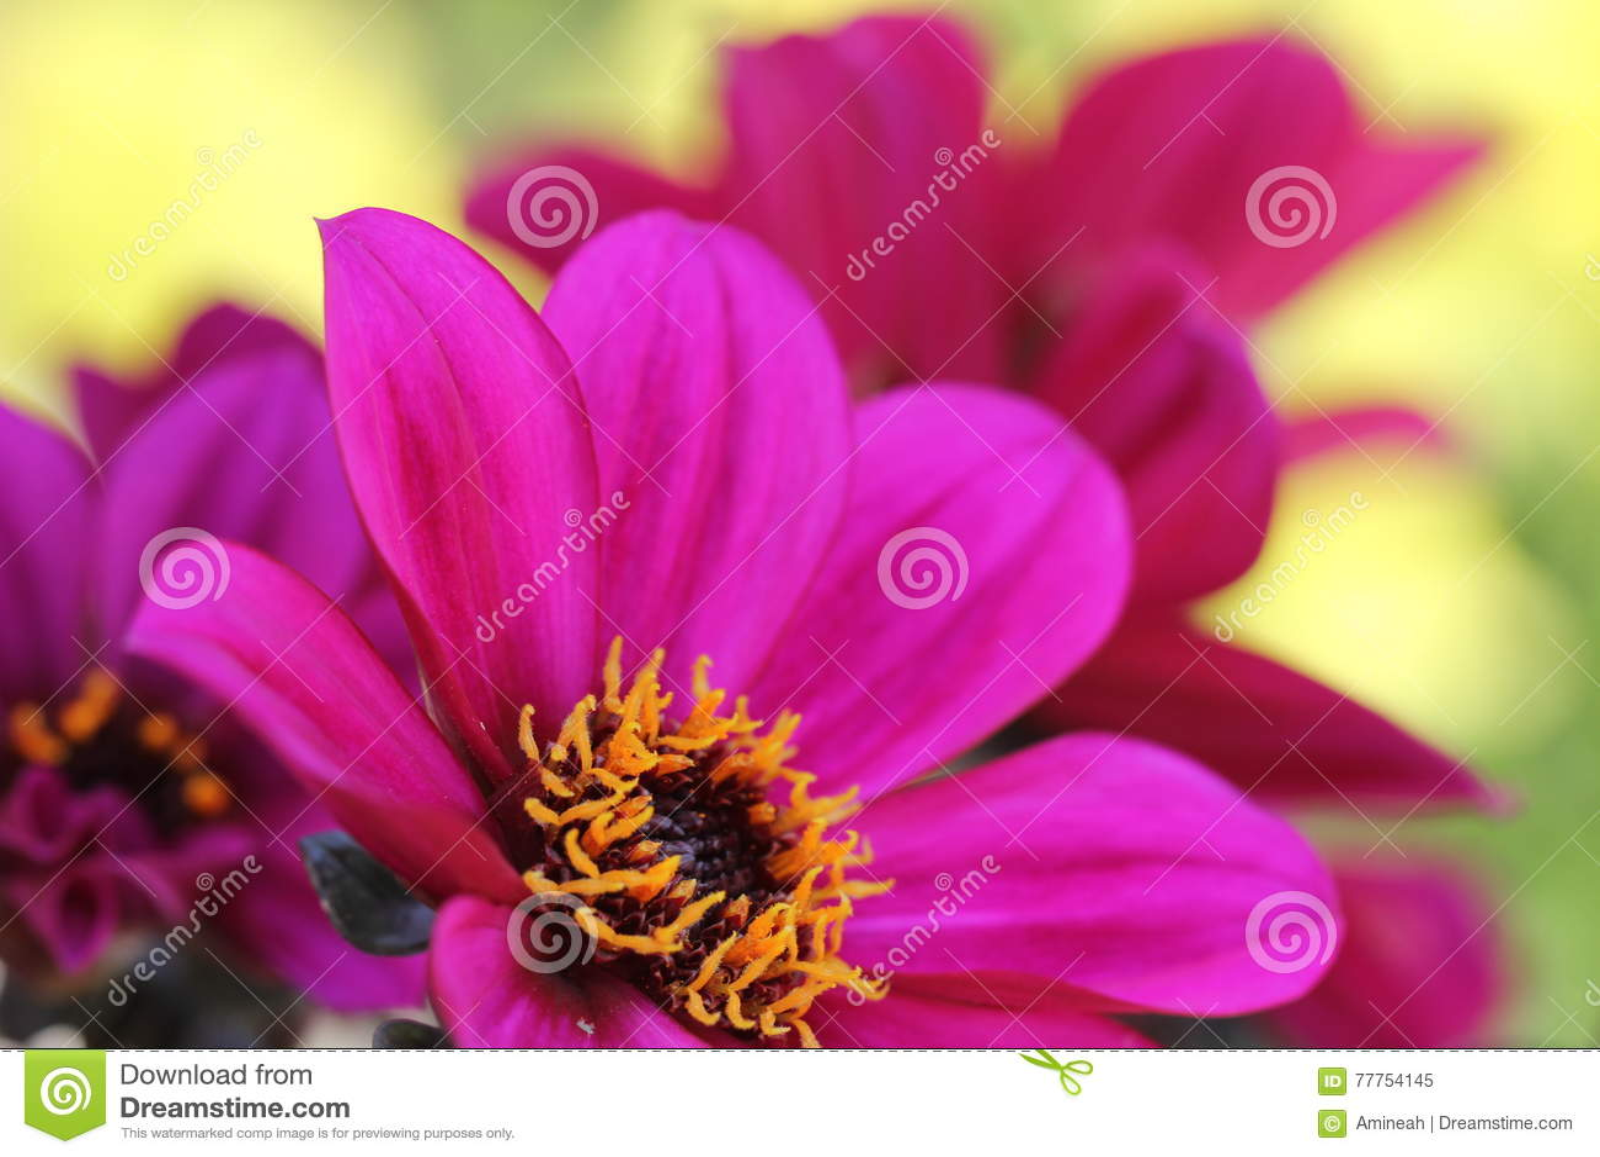 Purple dahlia flowers stock image image of love celebration 77754145 beautiful purple dahlia flowers on green background izmirmasajfo